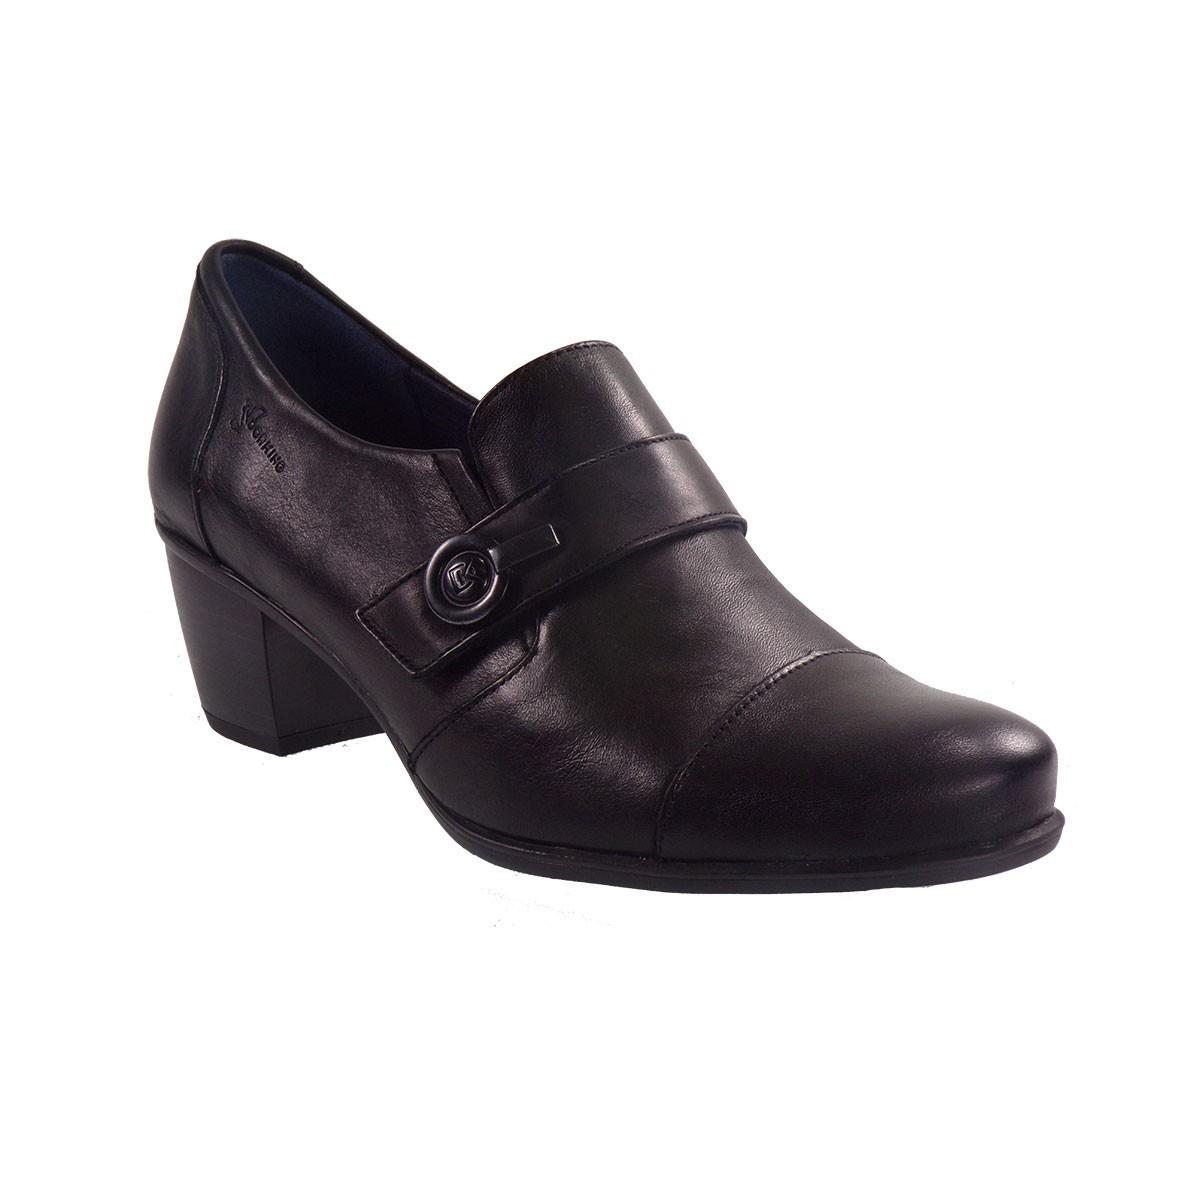 Dorking Γυναικεία Παπούτσια BRΙSPA D7572-SUΝΒ Μαύρο Δέρμα